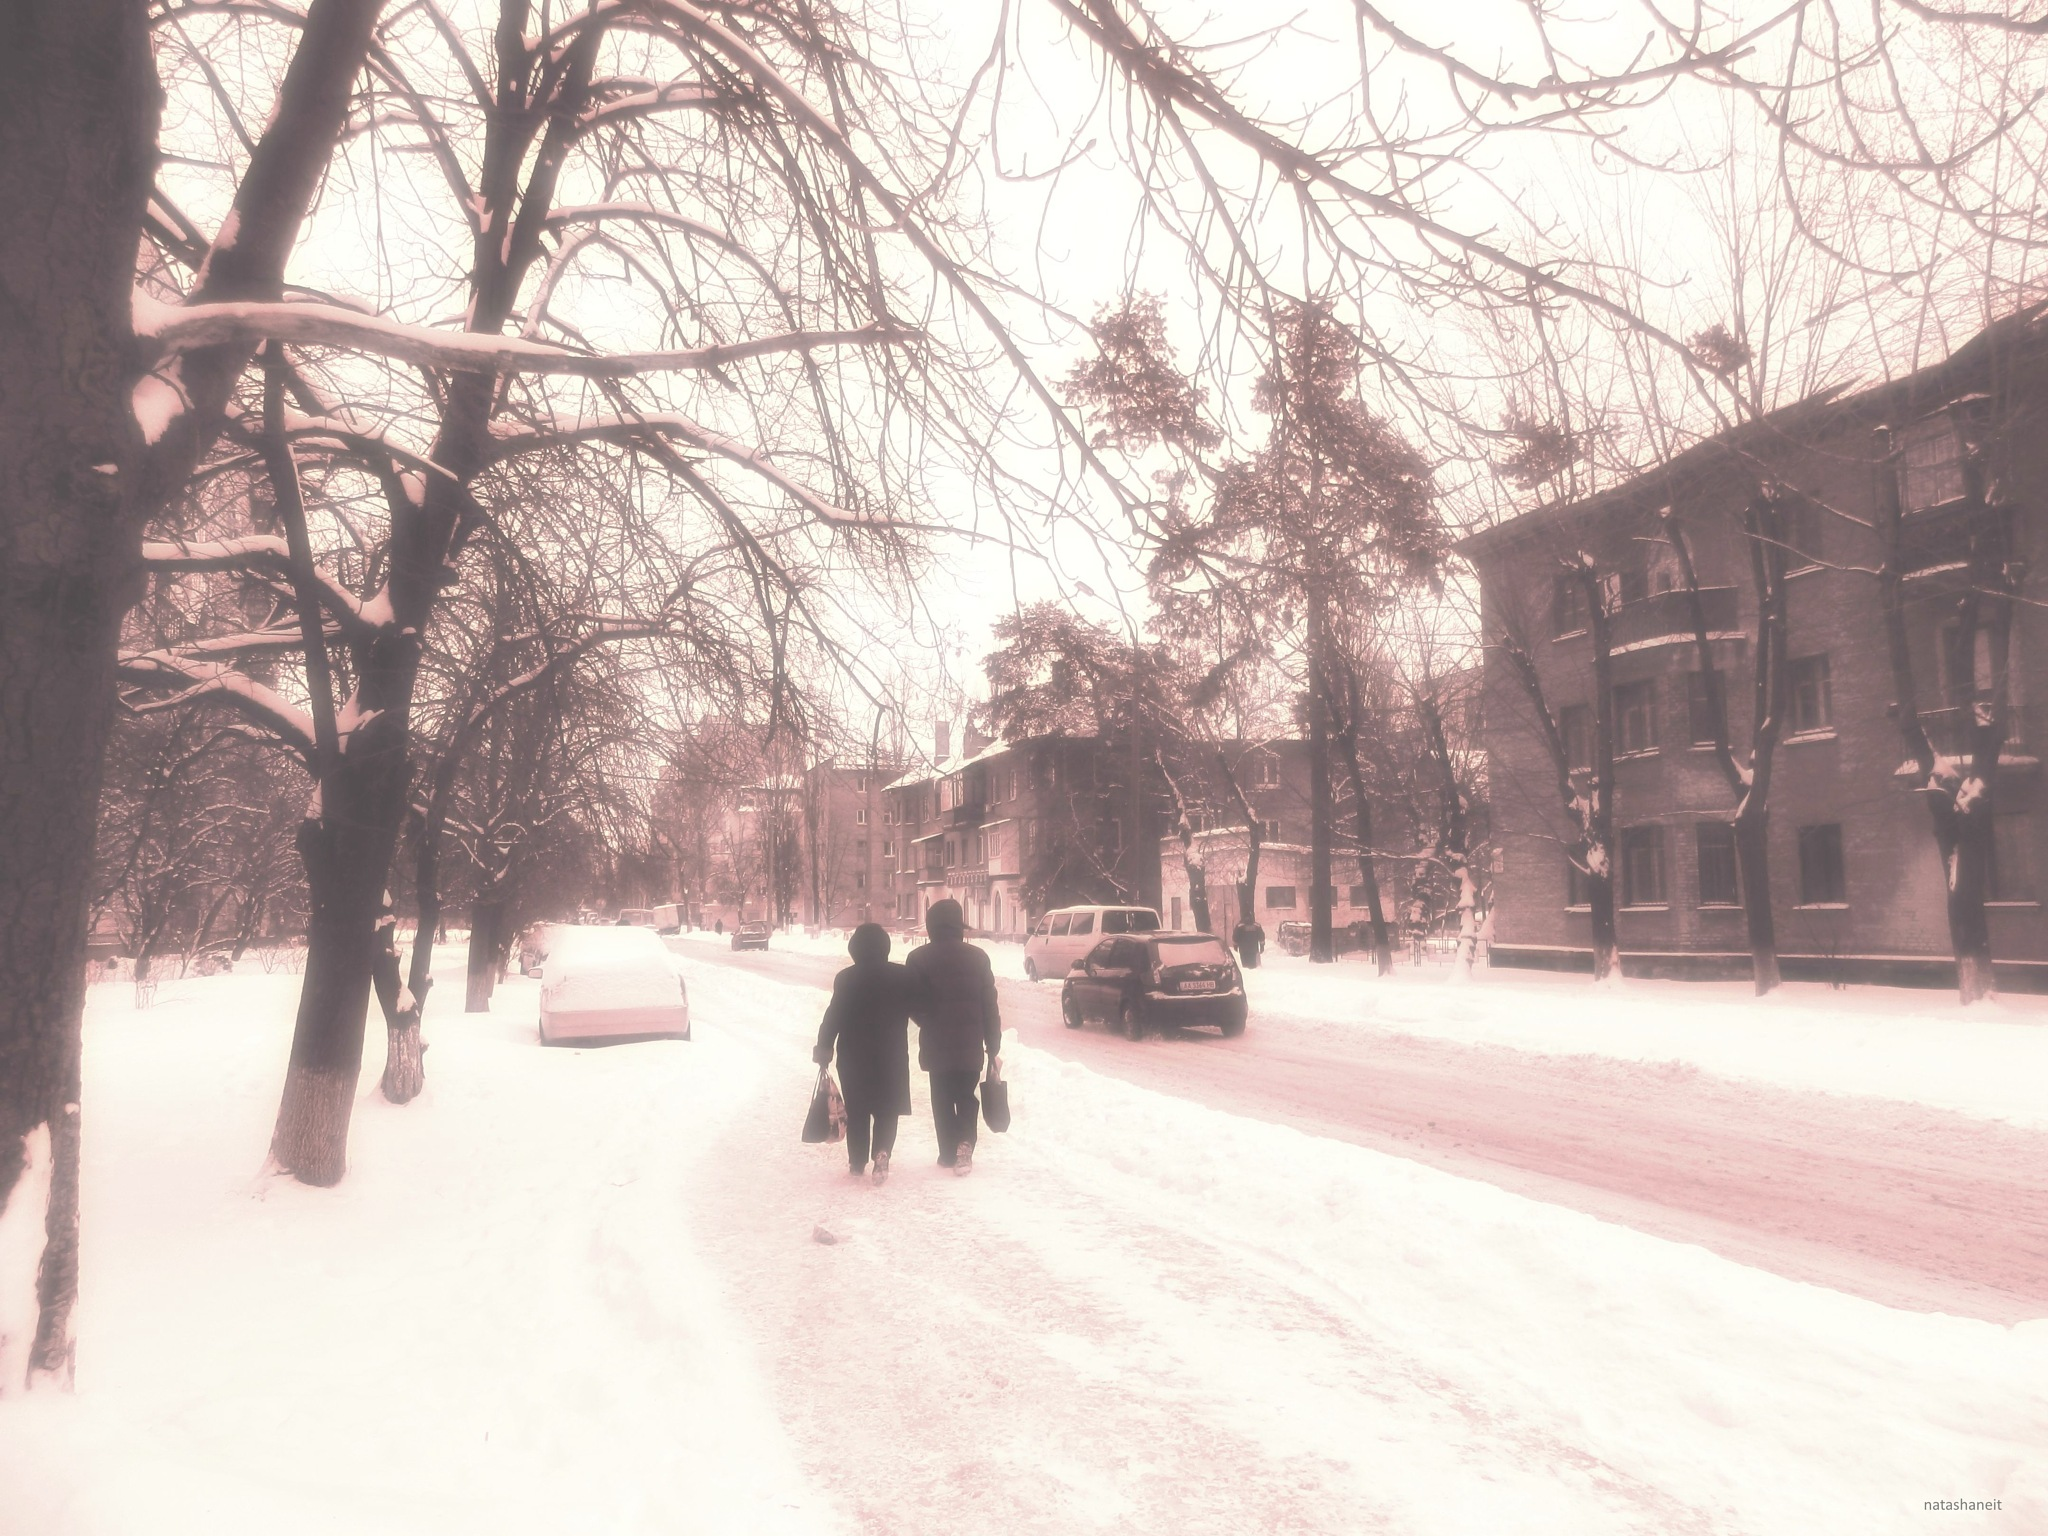 Winter walk by natashaneit